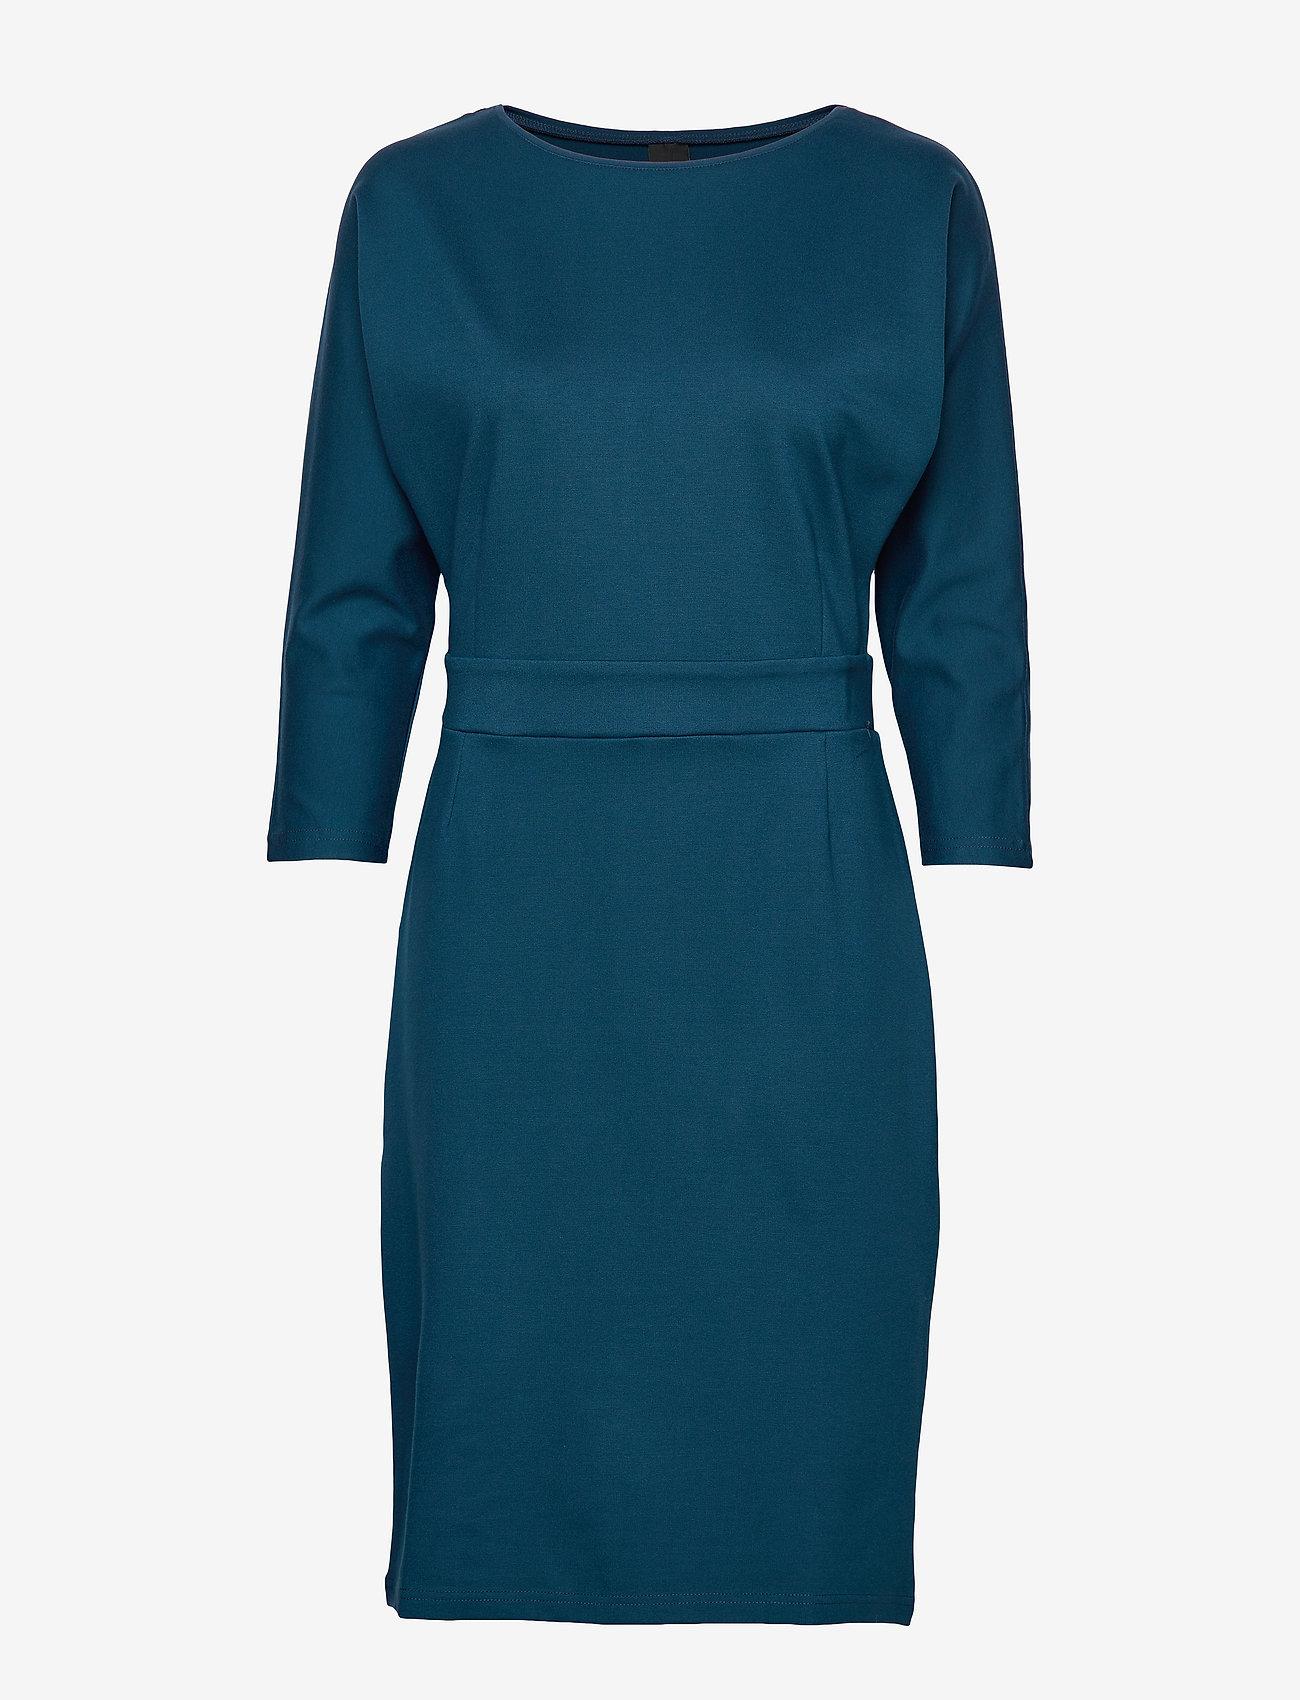 Nanso - Ladies dress, Asta - midi kjoler - dark teal - 0